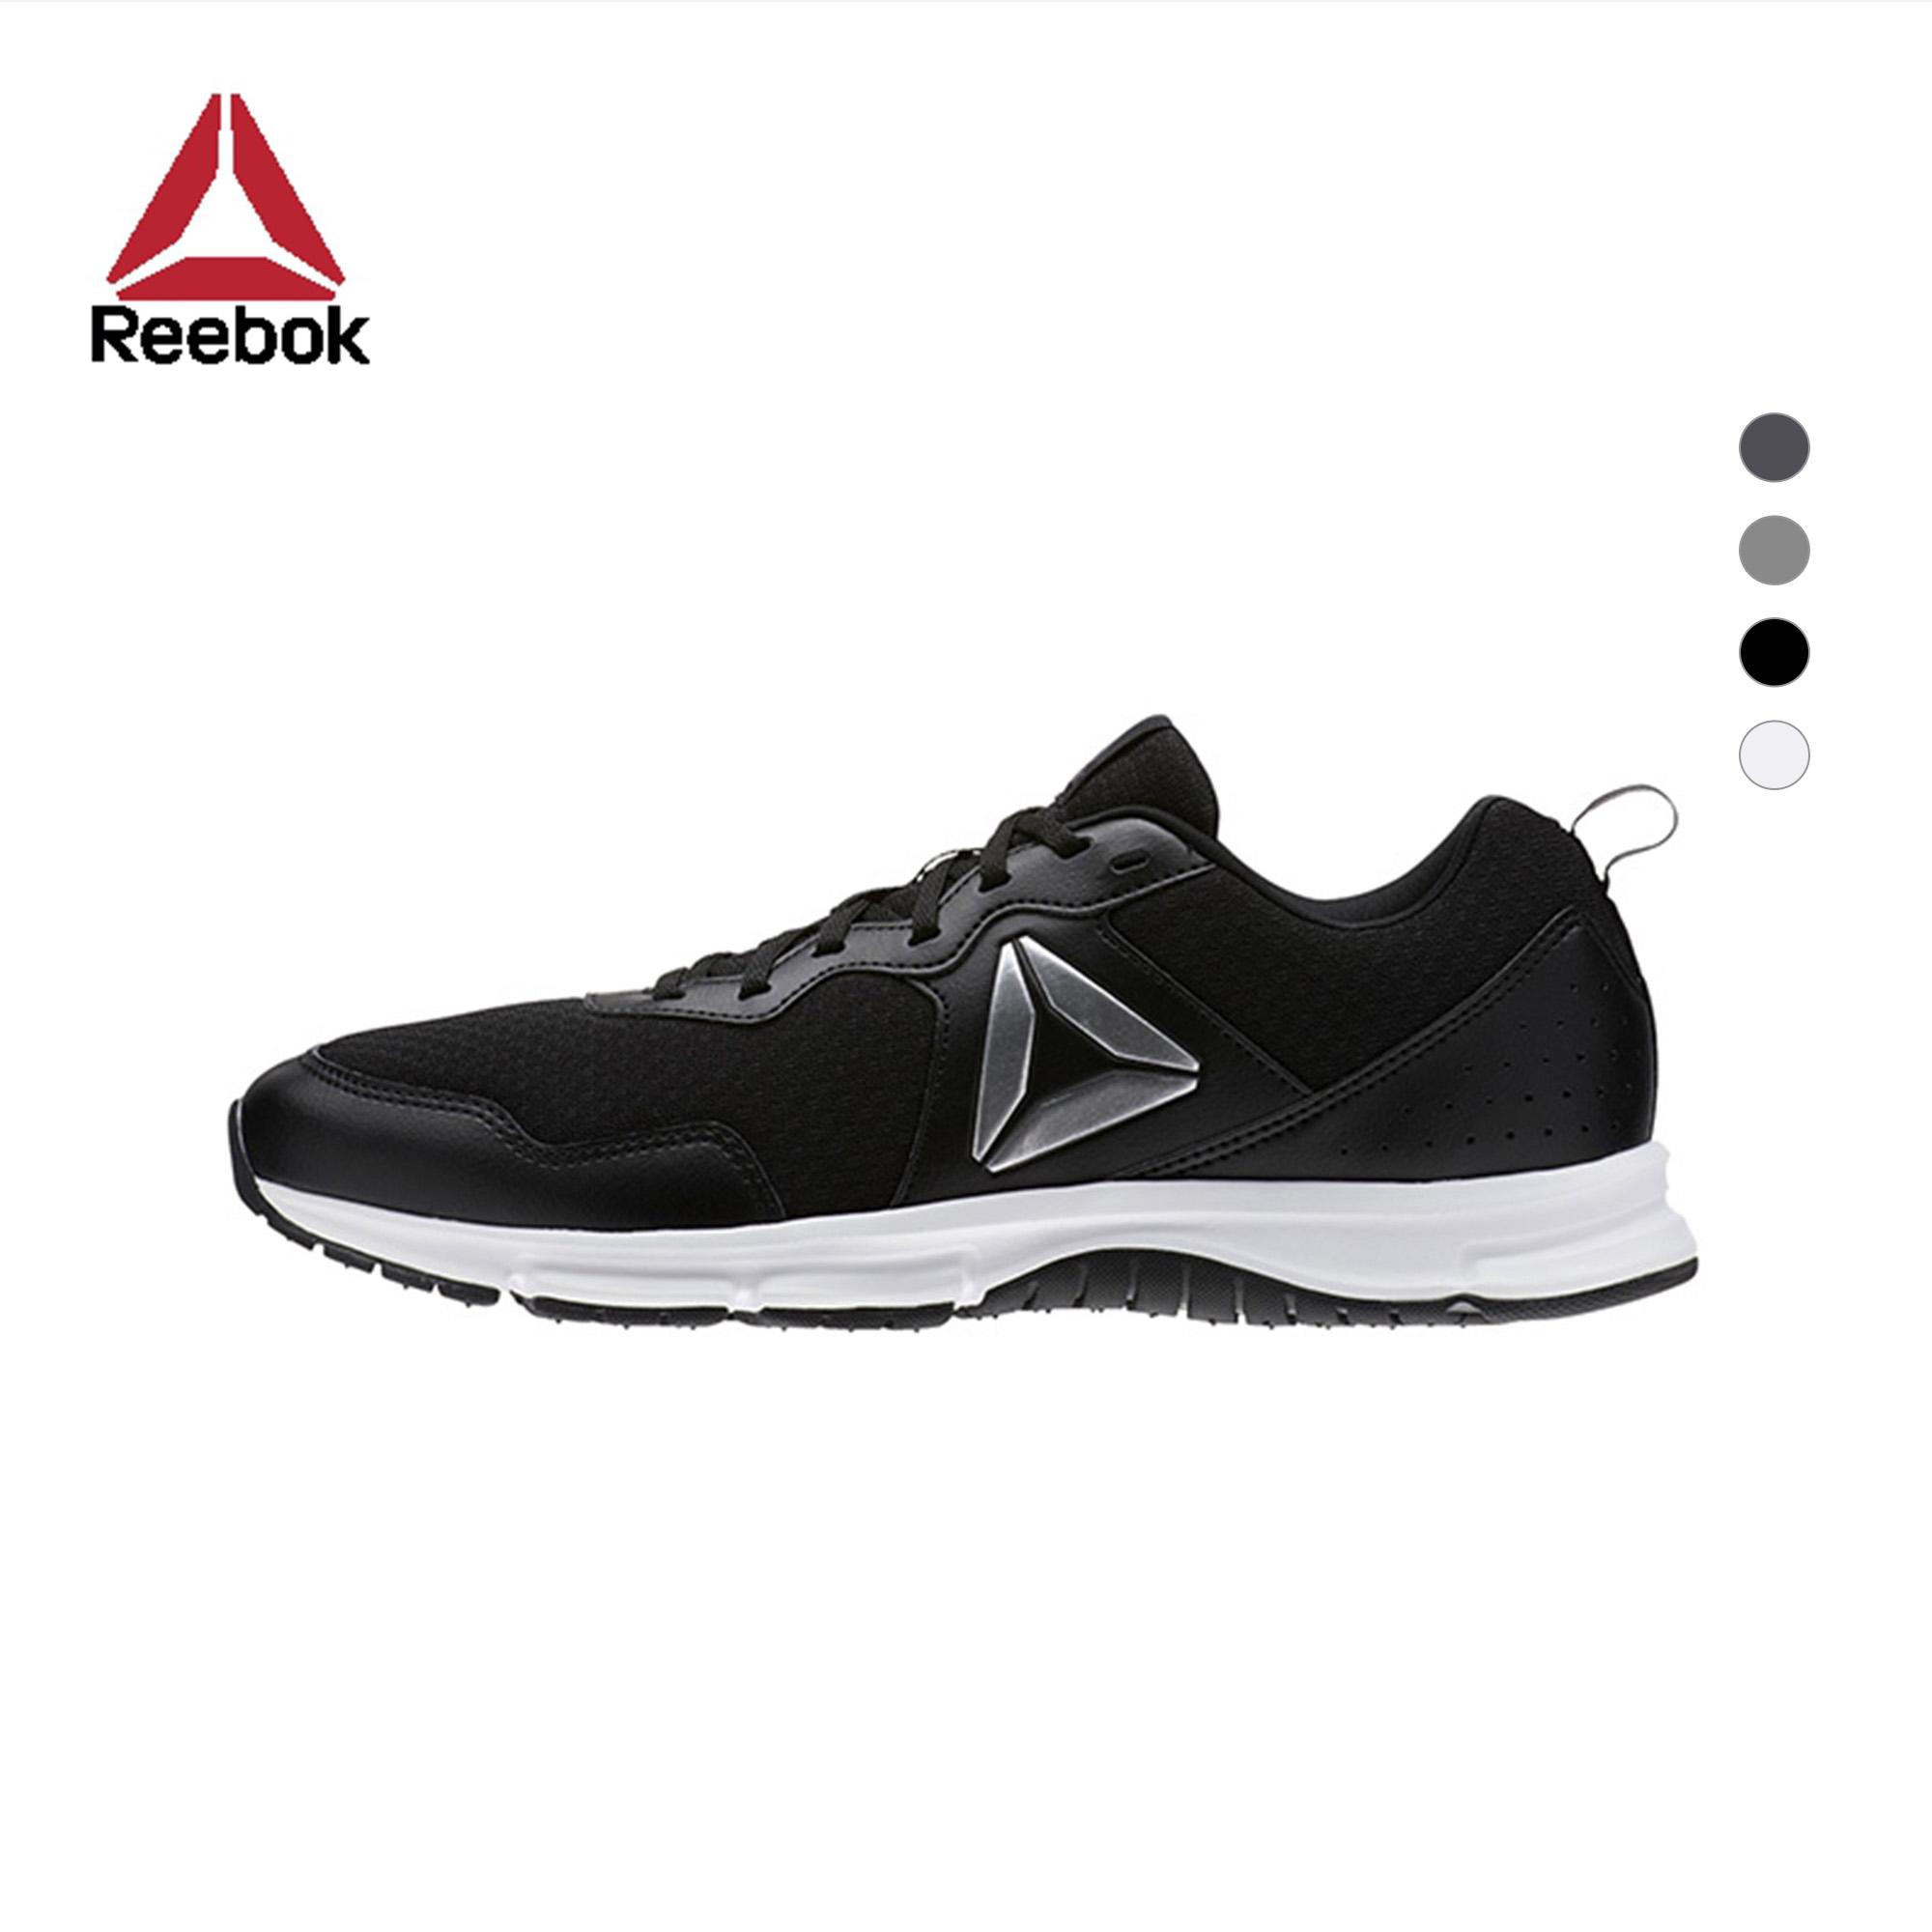 Reebok锐步官方 运动健身EXPRESS RUNNER 2.0男子低帮跑步鞋EGI62